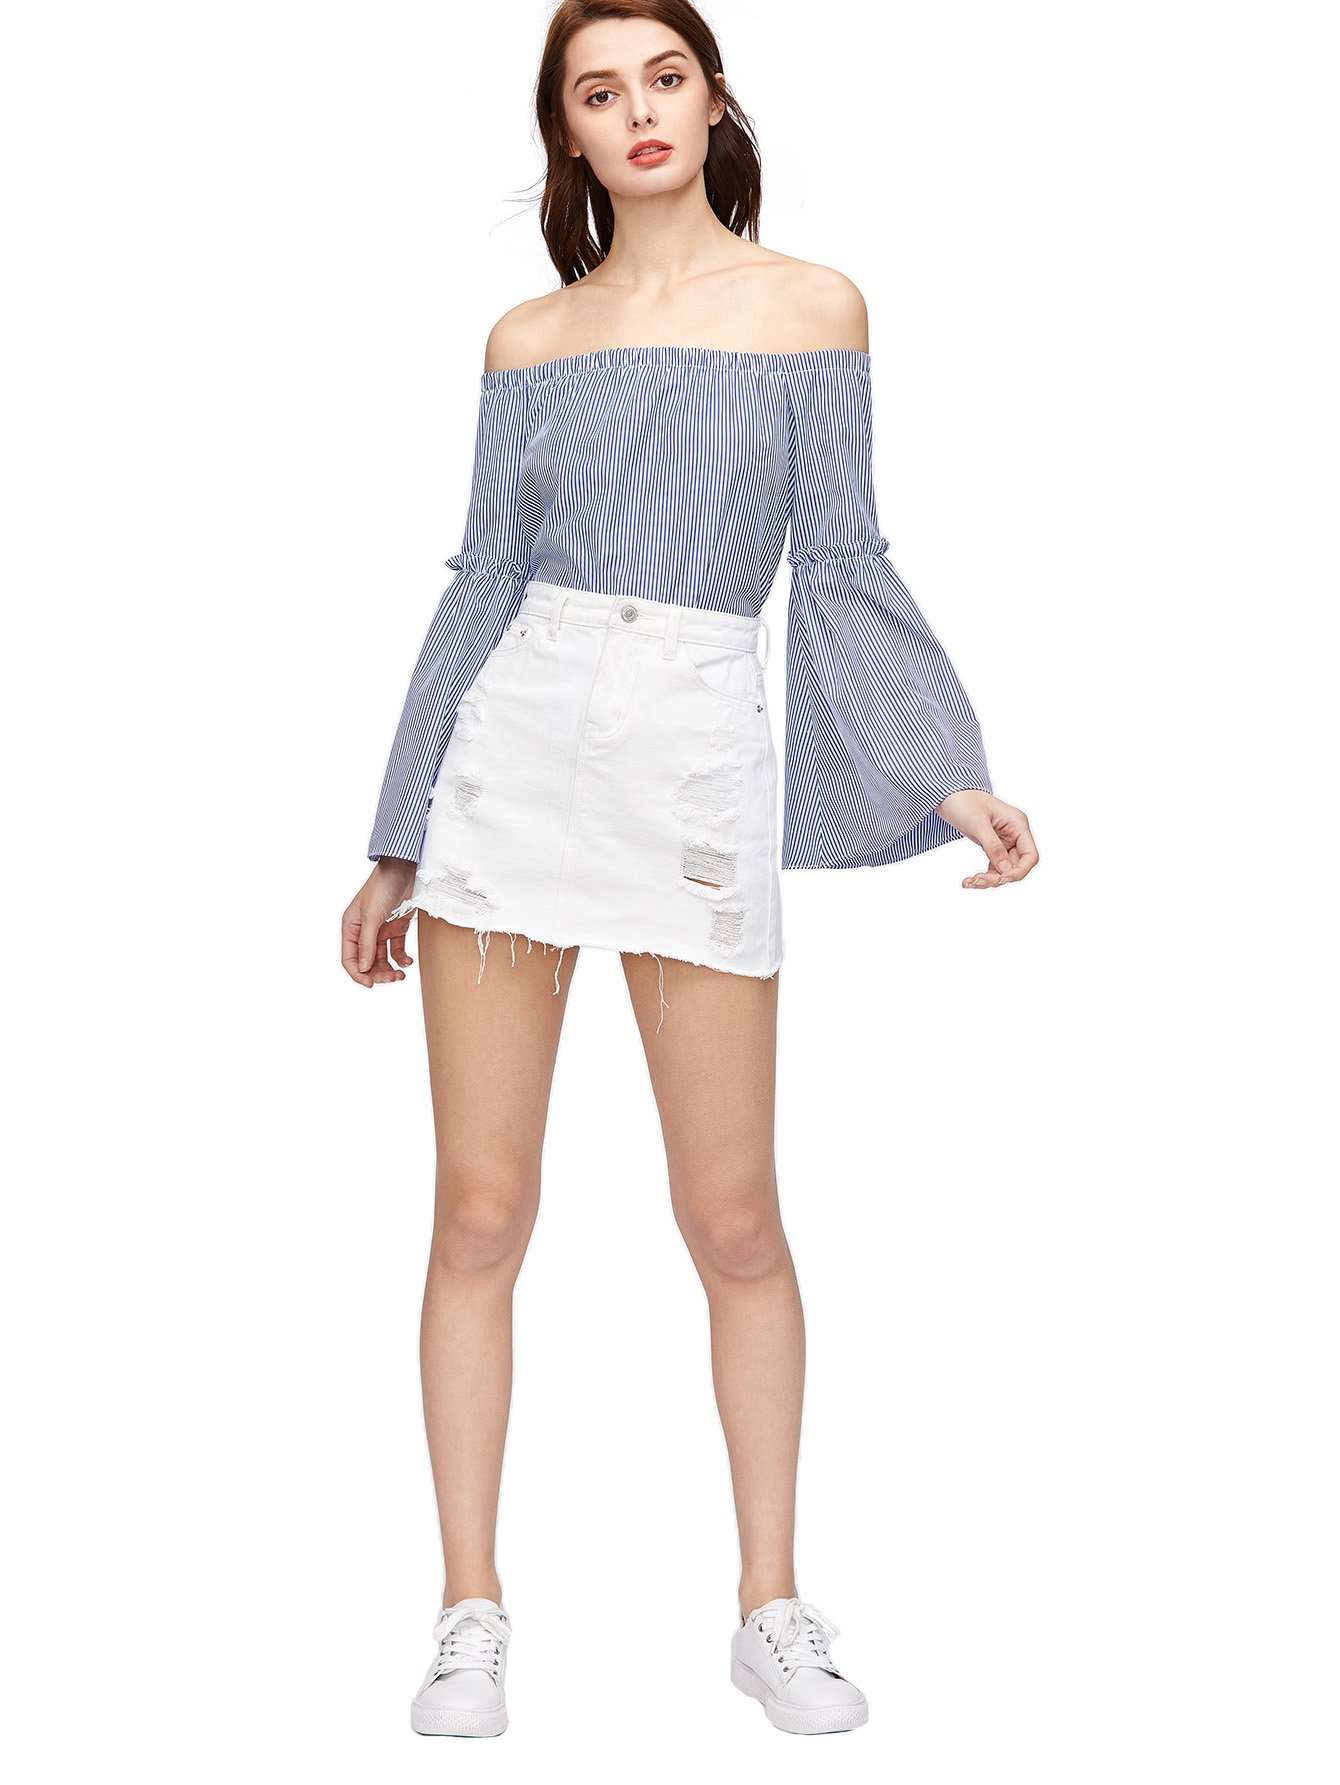 Verdusa Women's Casual Distressed Fray Hem A-Line Denim Short Skirt White S by Verdusa (Image #4)